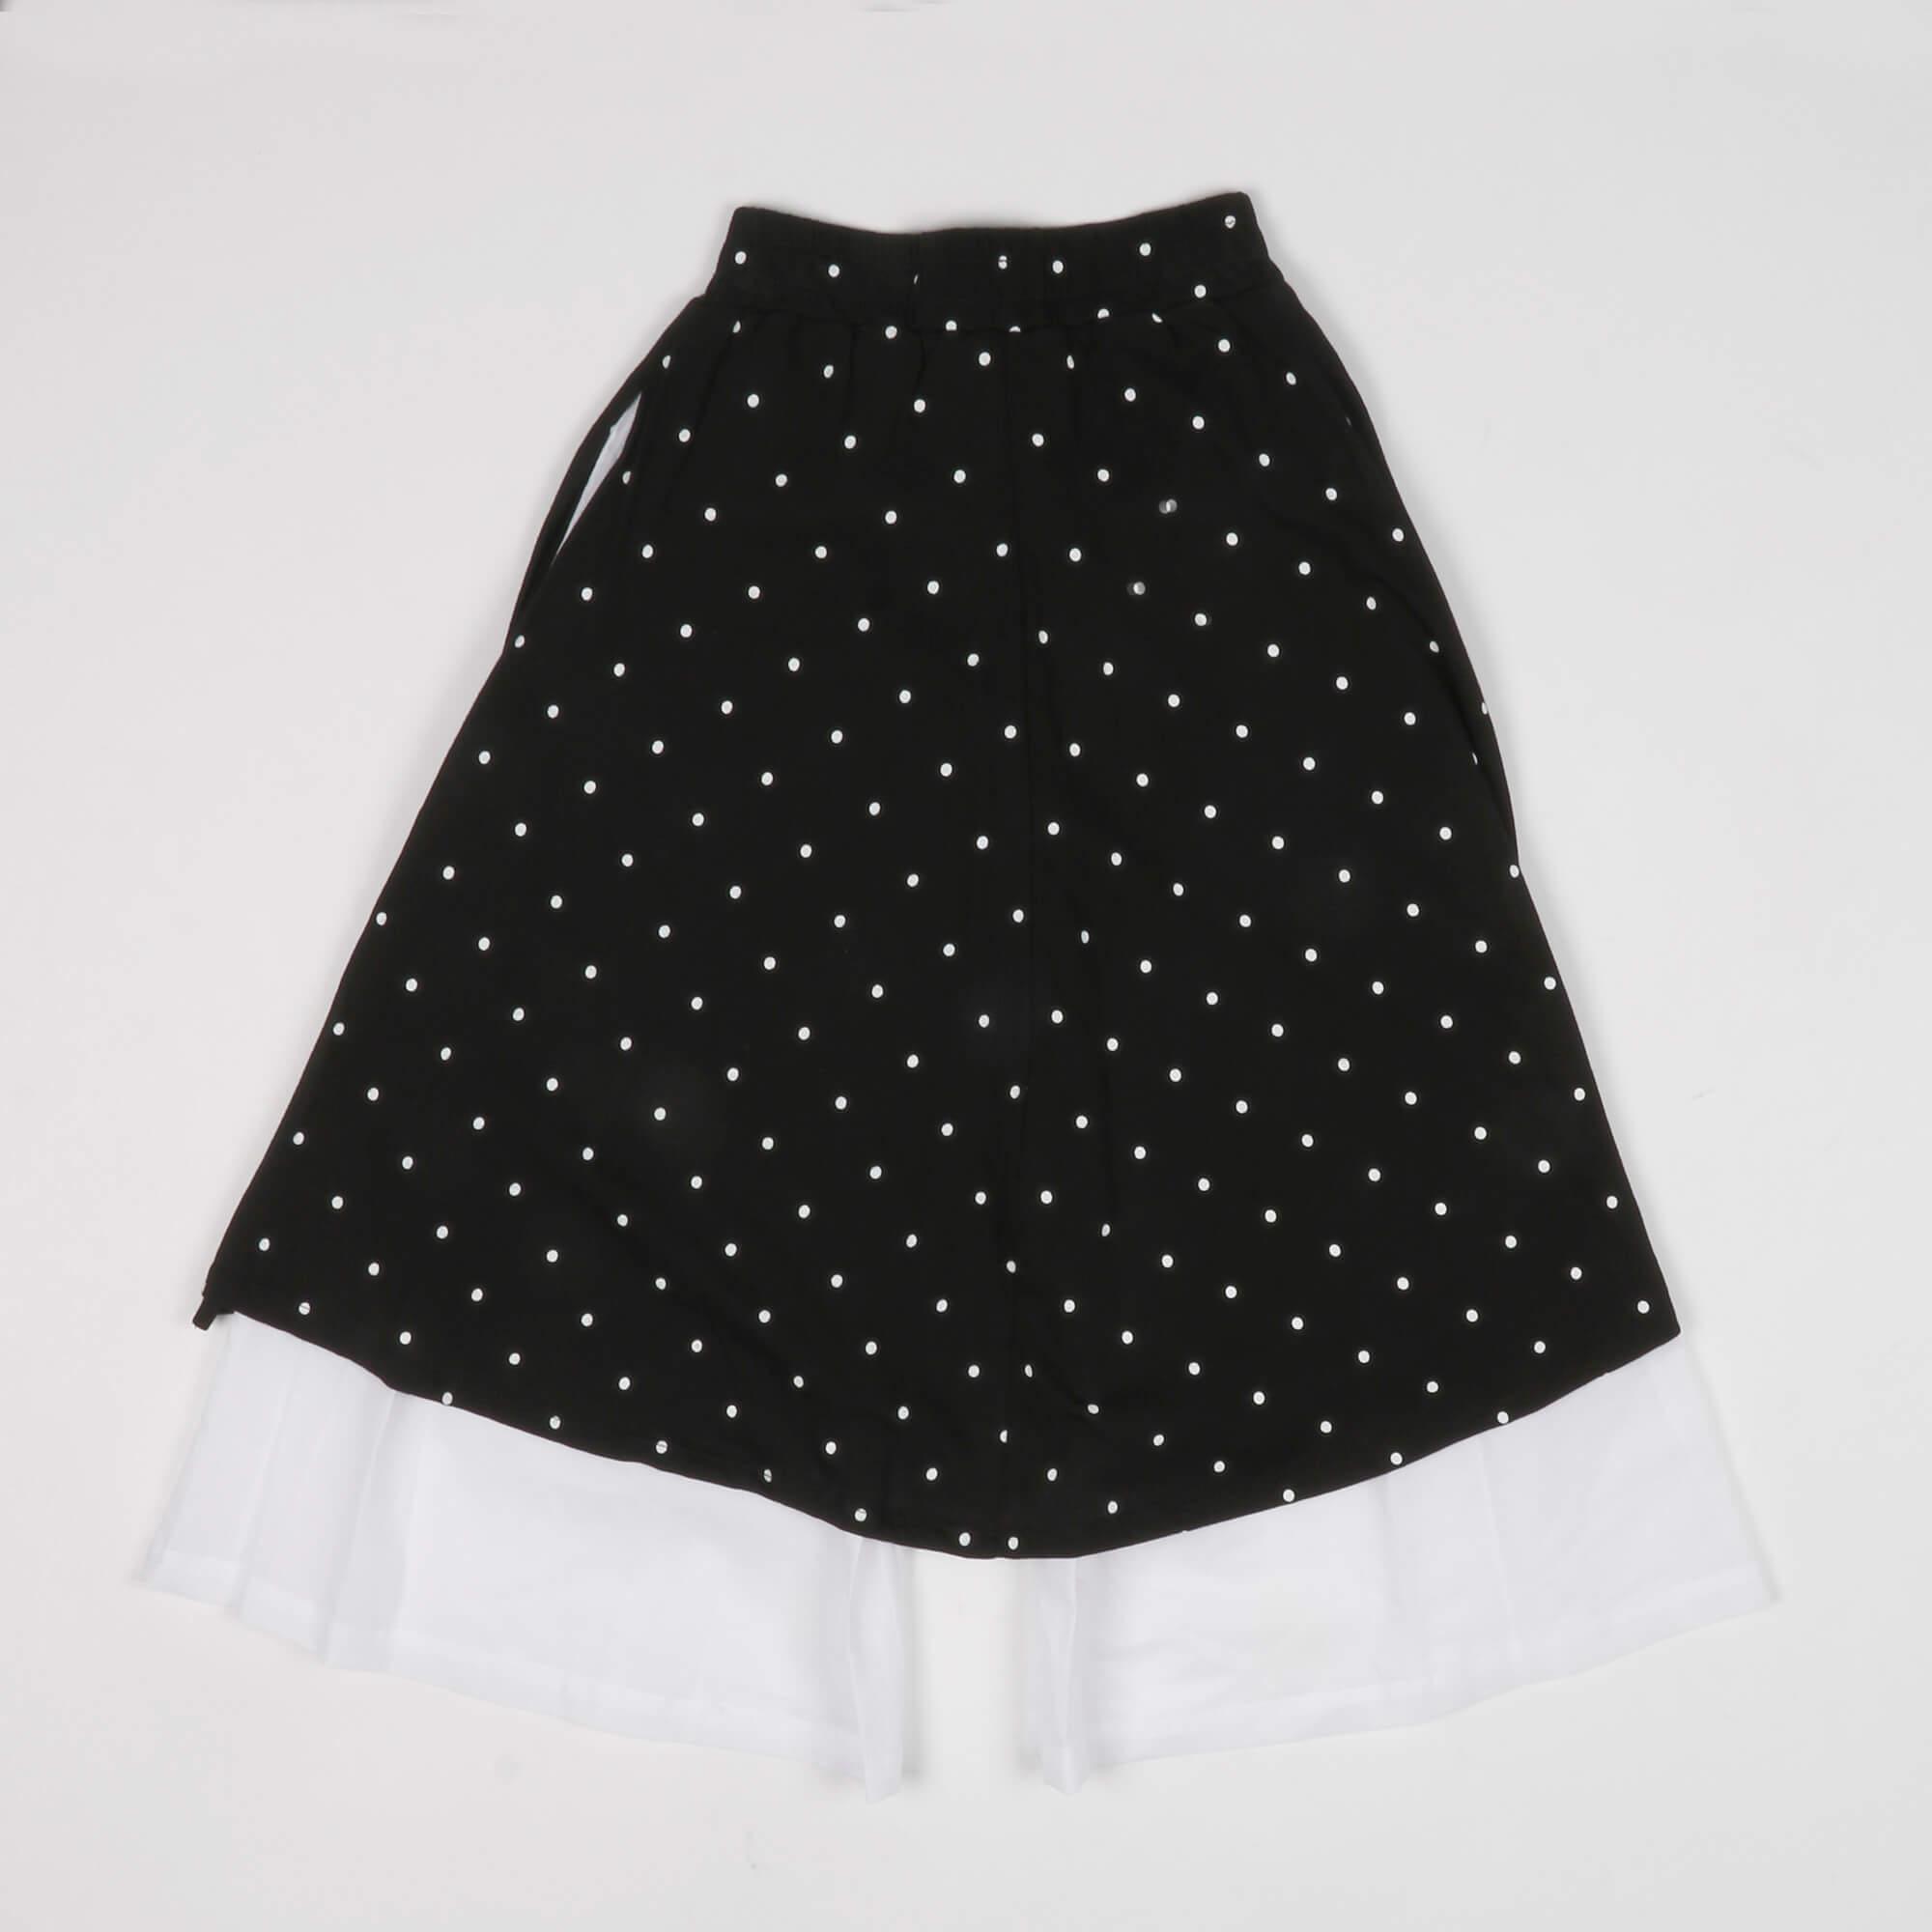 Panta gonna bicolore -Bianco/ Nero